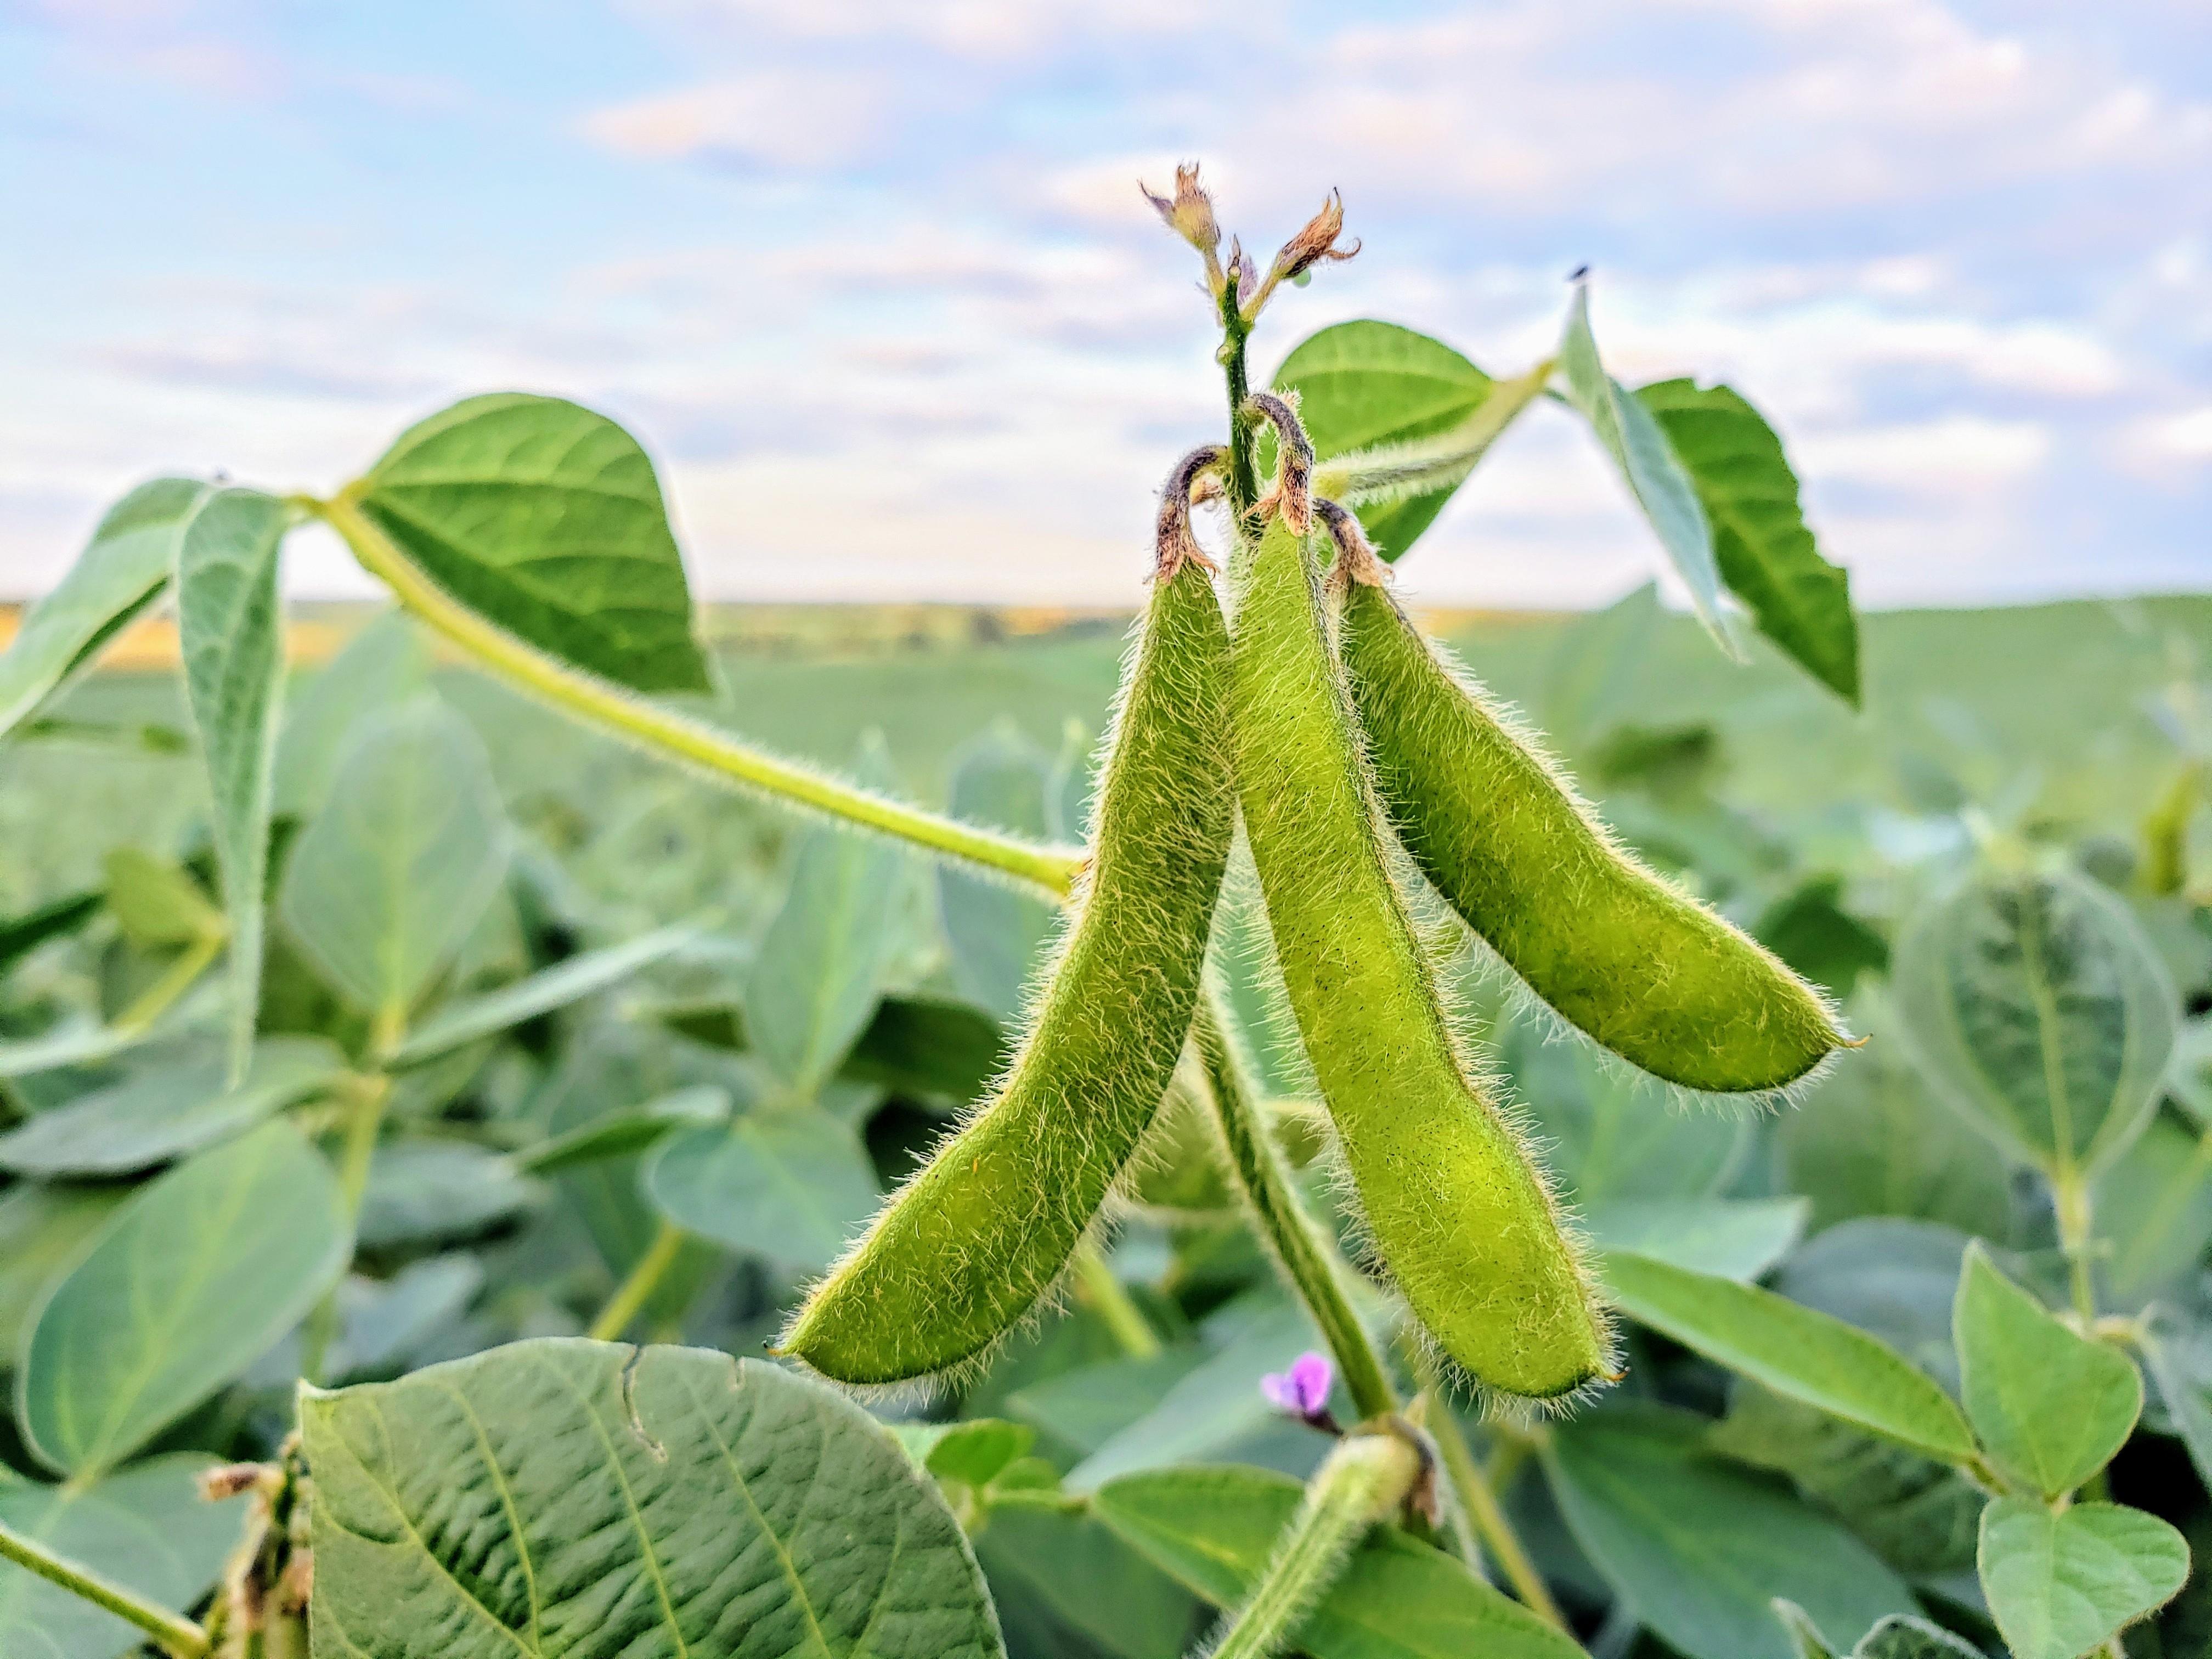 Yield contest winner tops 106 bushels per acre